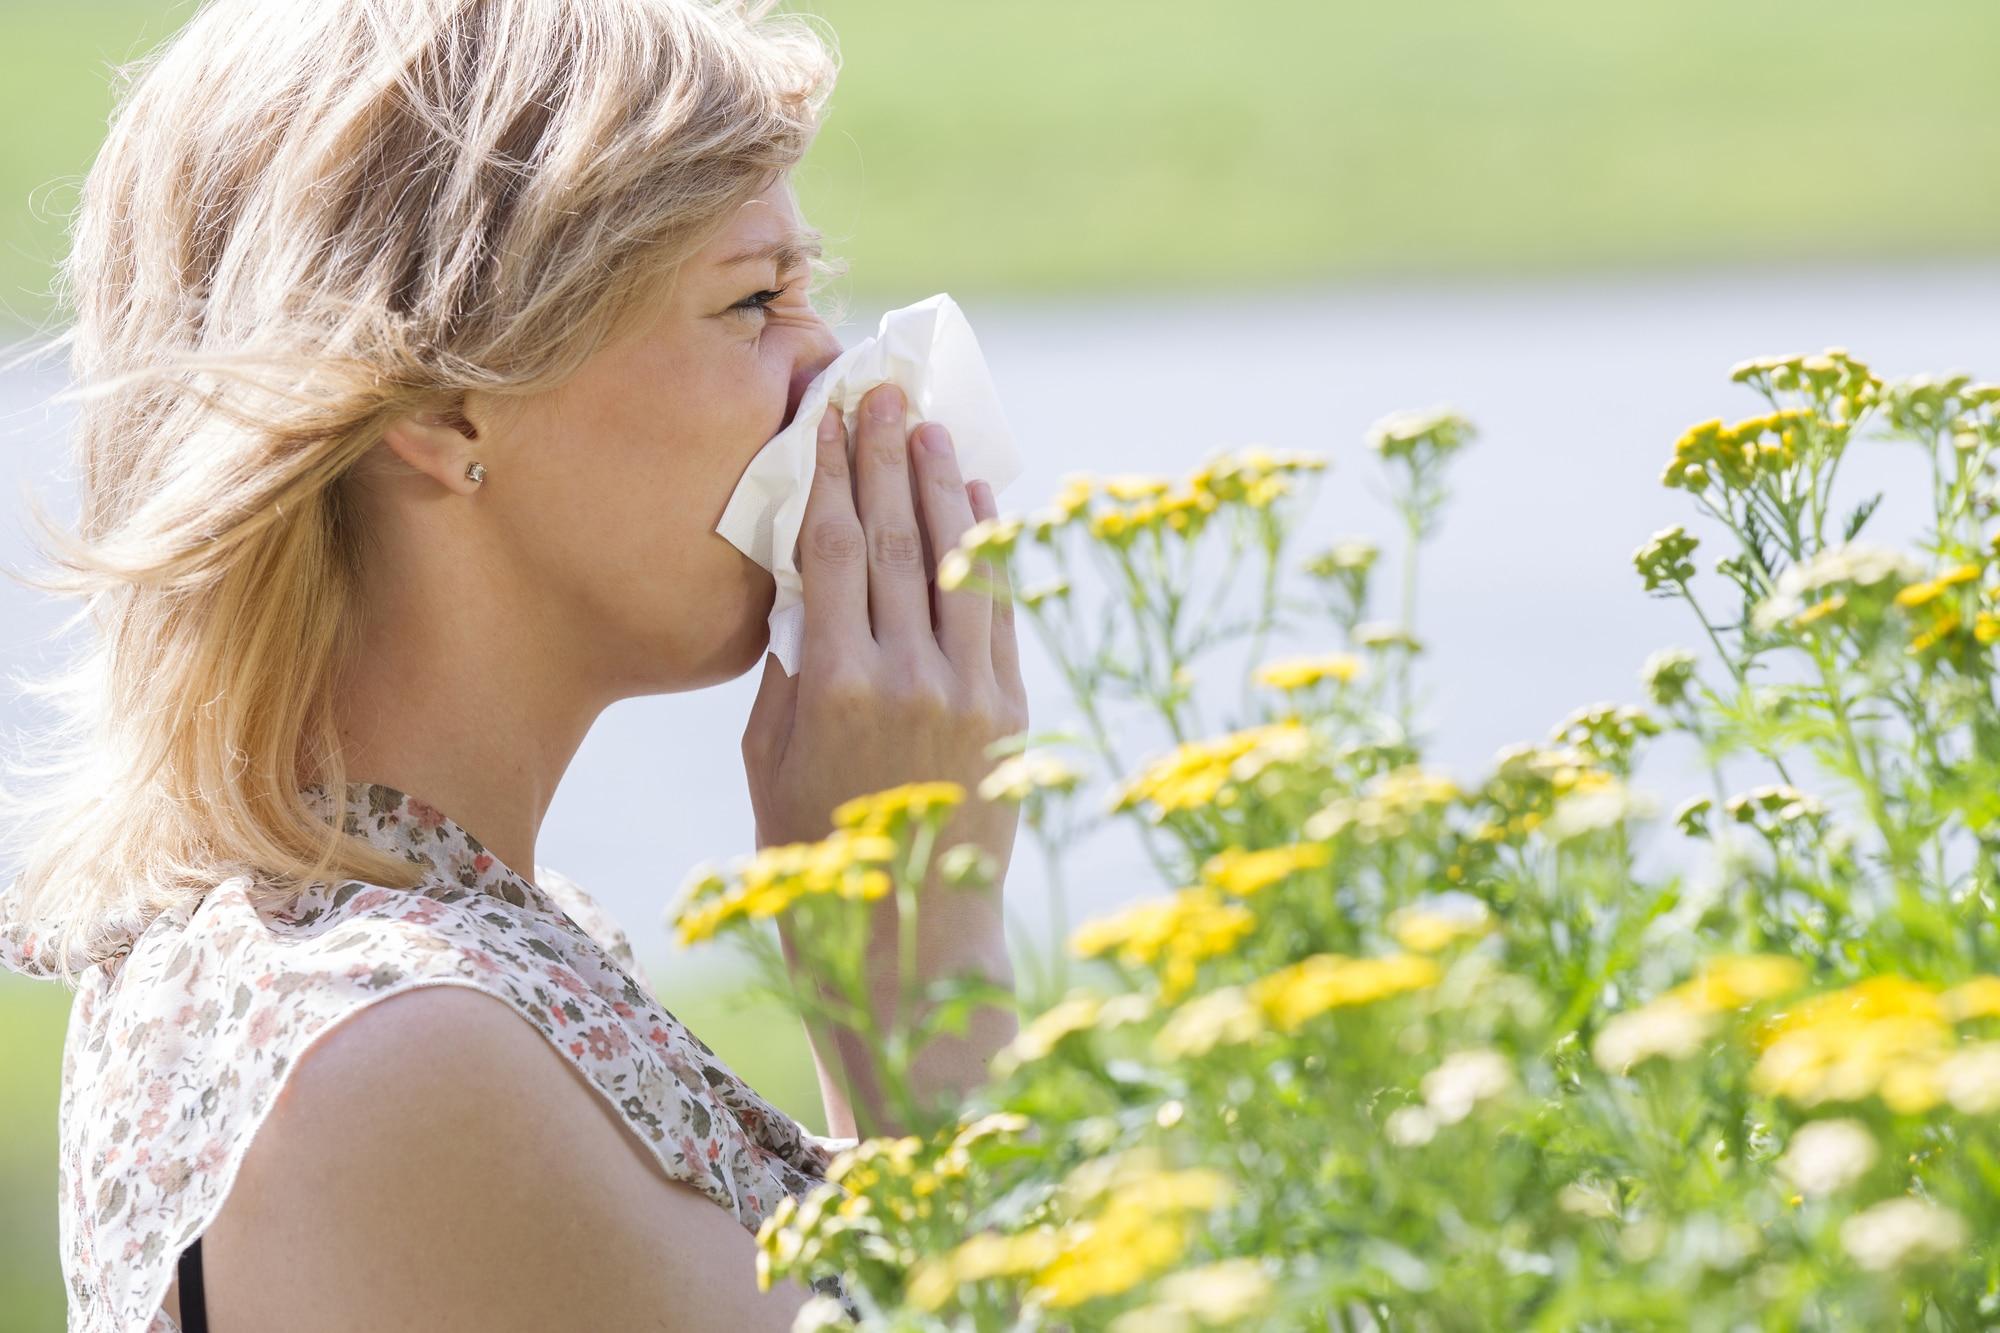 Relief for Seasonal Allergies